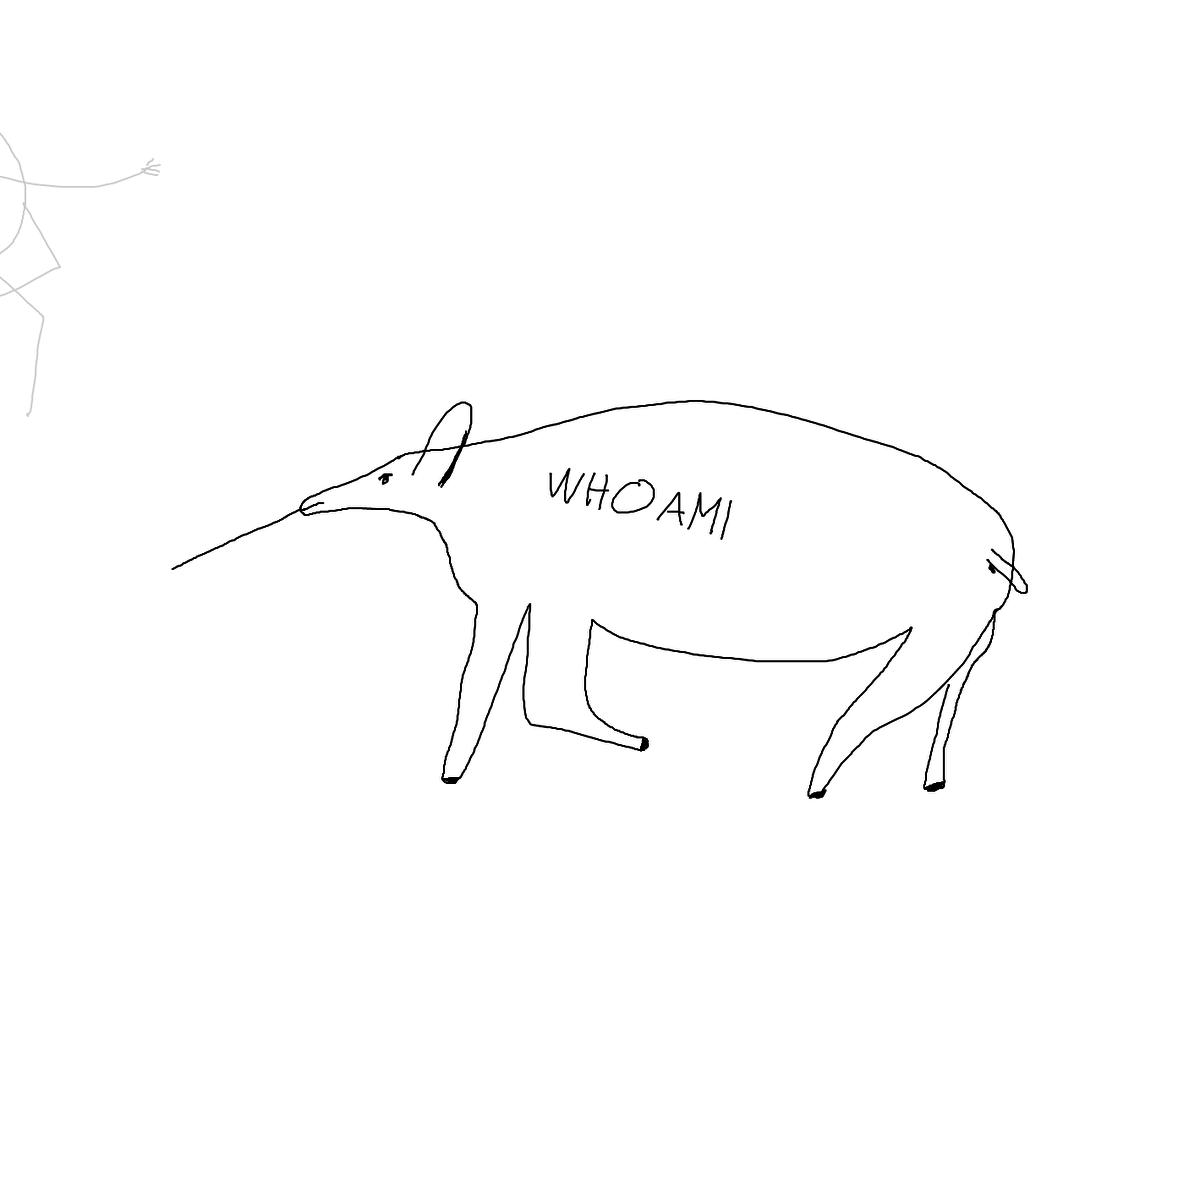 BAAAM drawing#2484 lat:52.4750022888183600lng: 13.4070615768432620